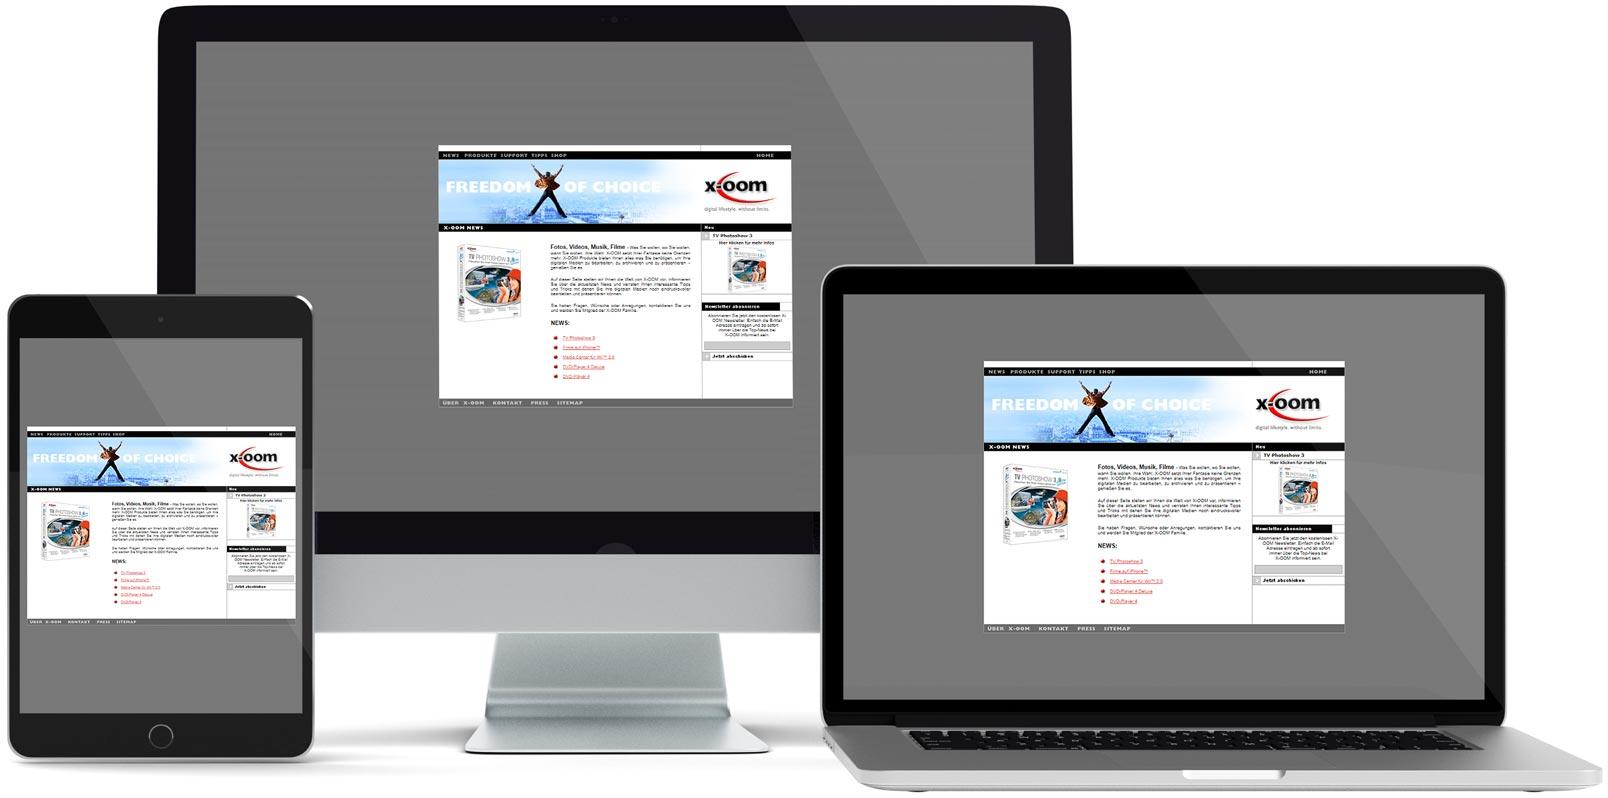 Dreamweaver Webdesign: X-OOM